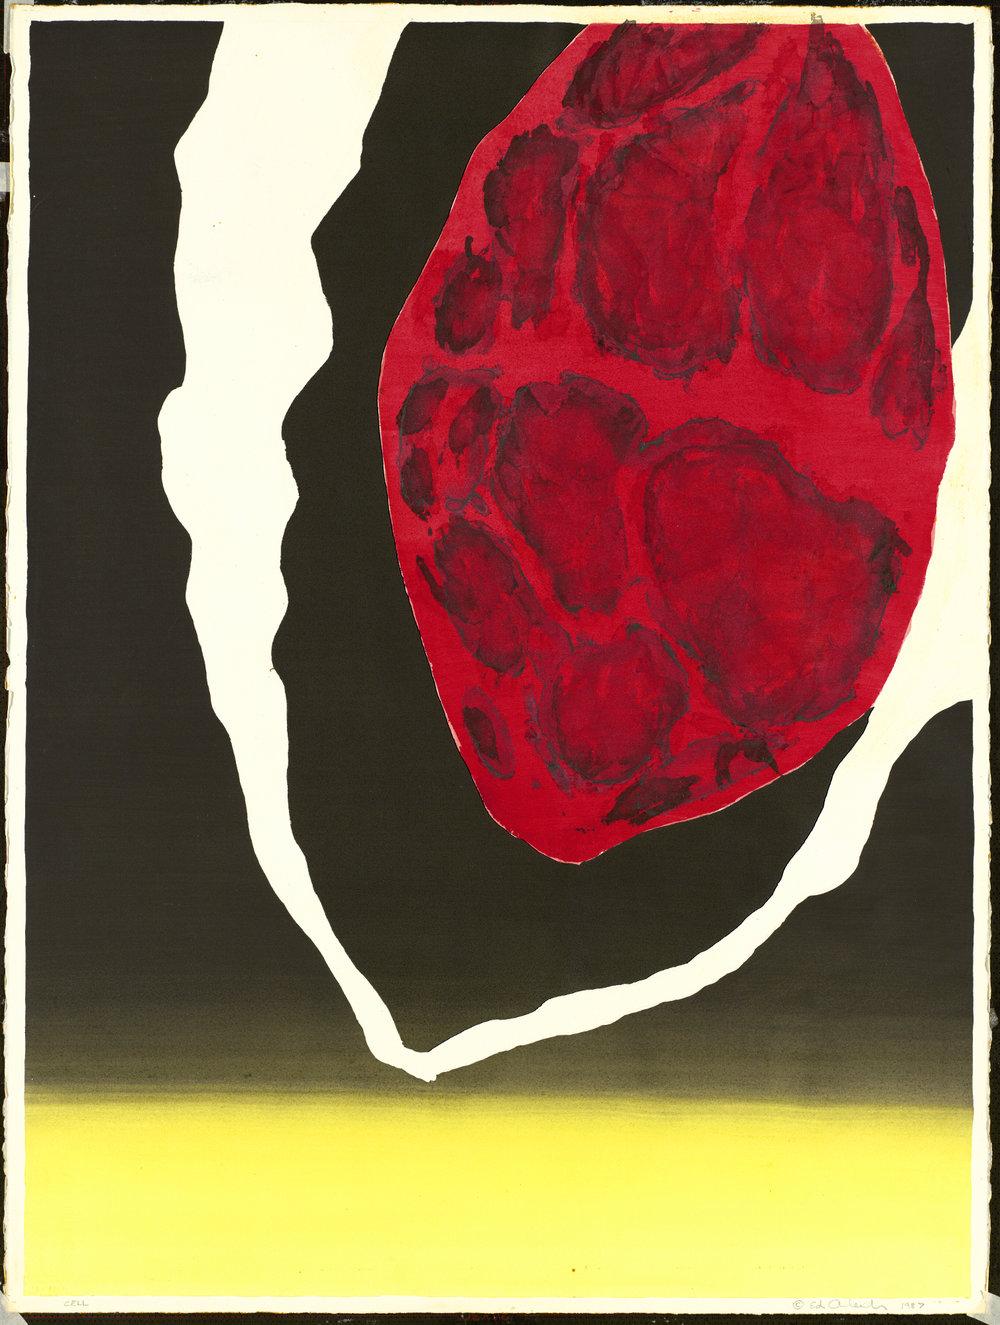 Cells: C-11 Study #2, 1987